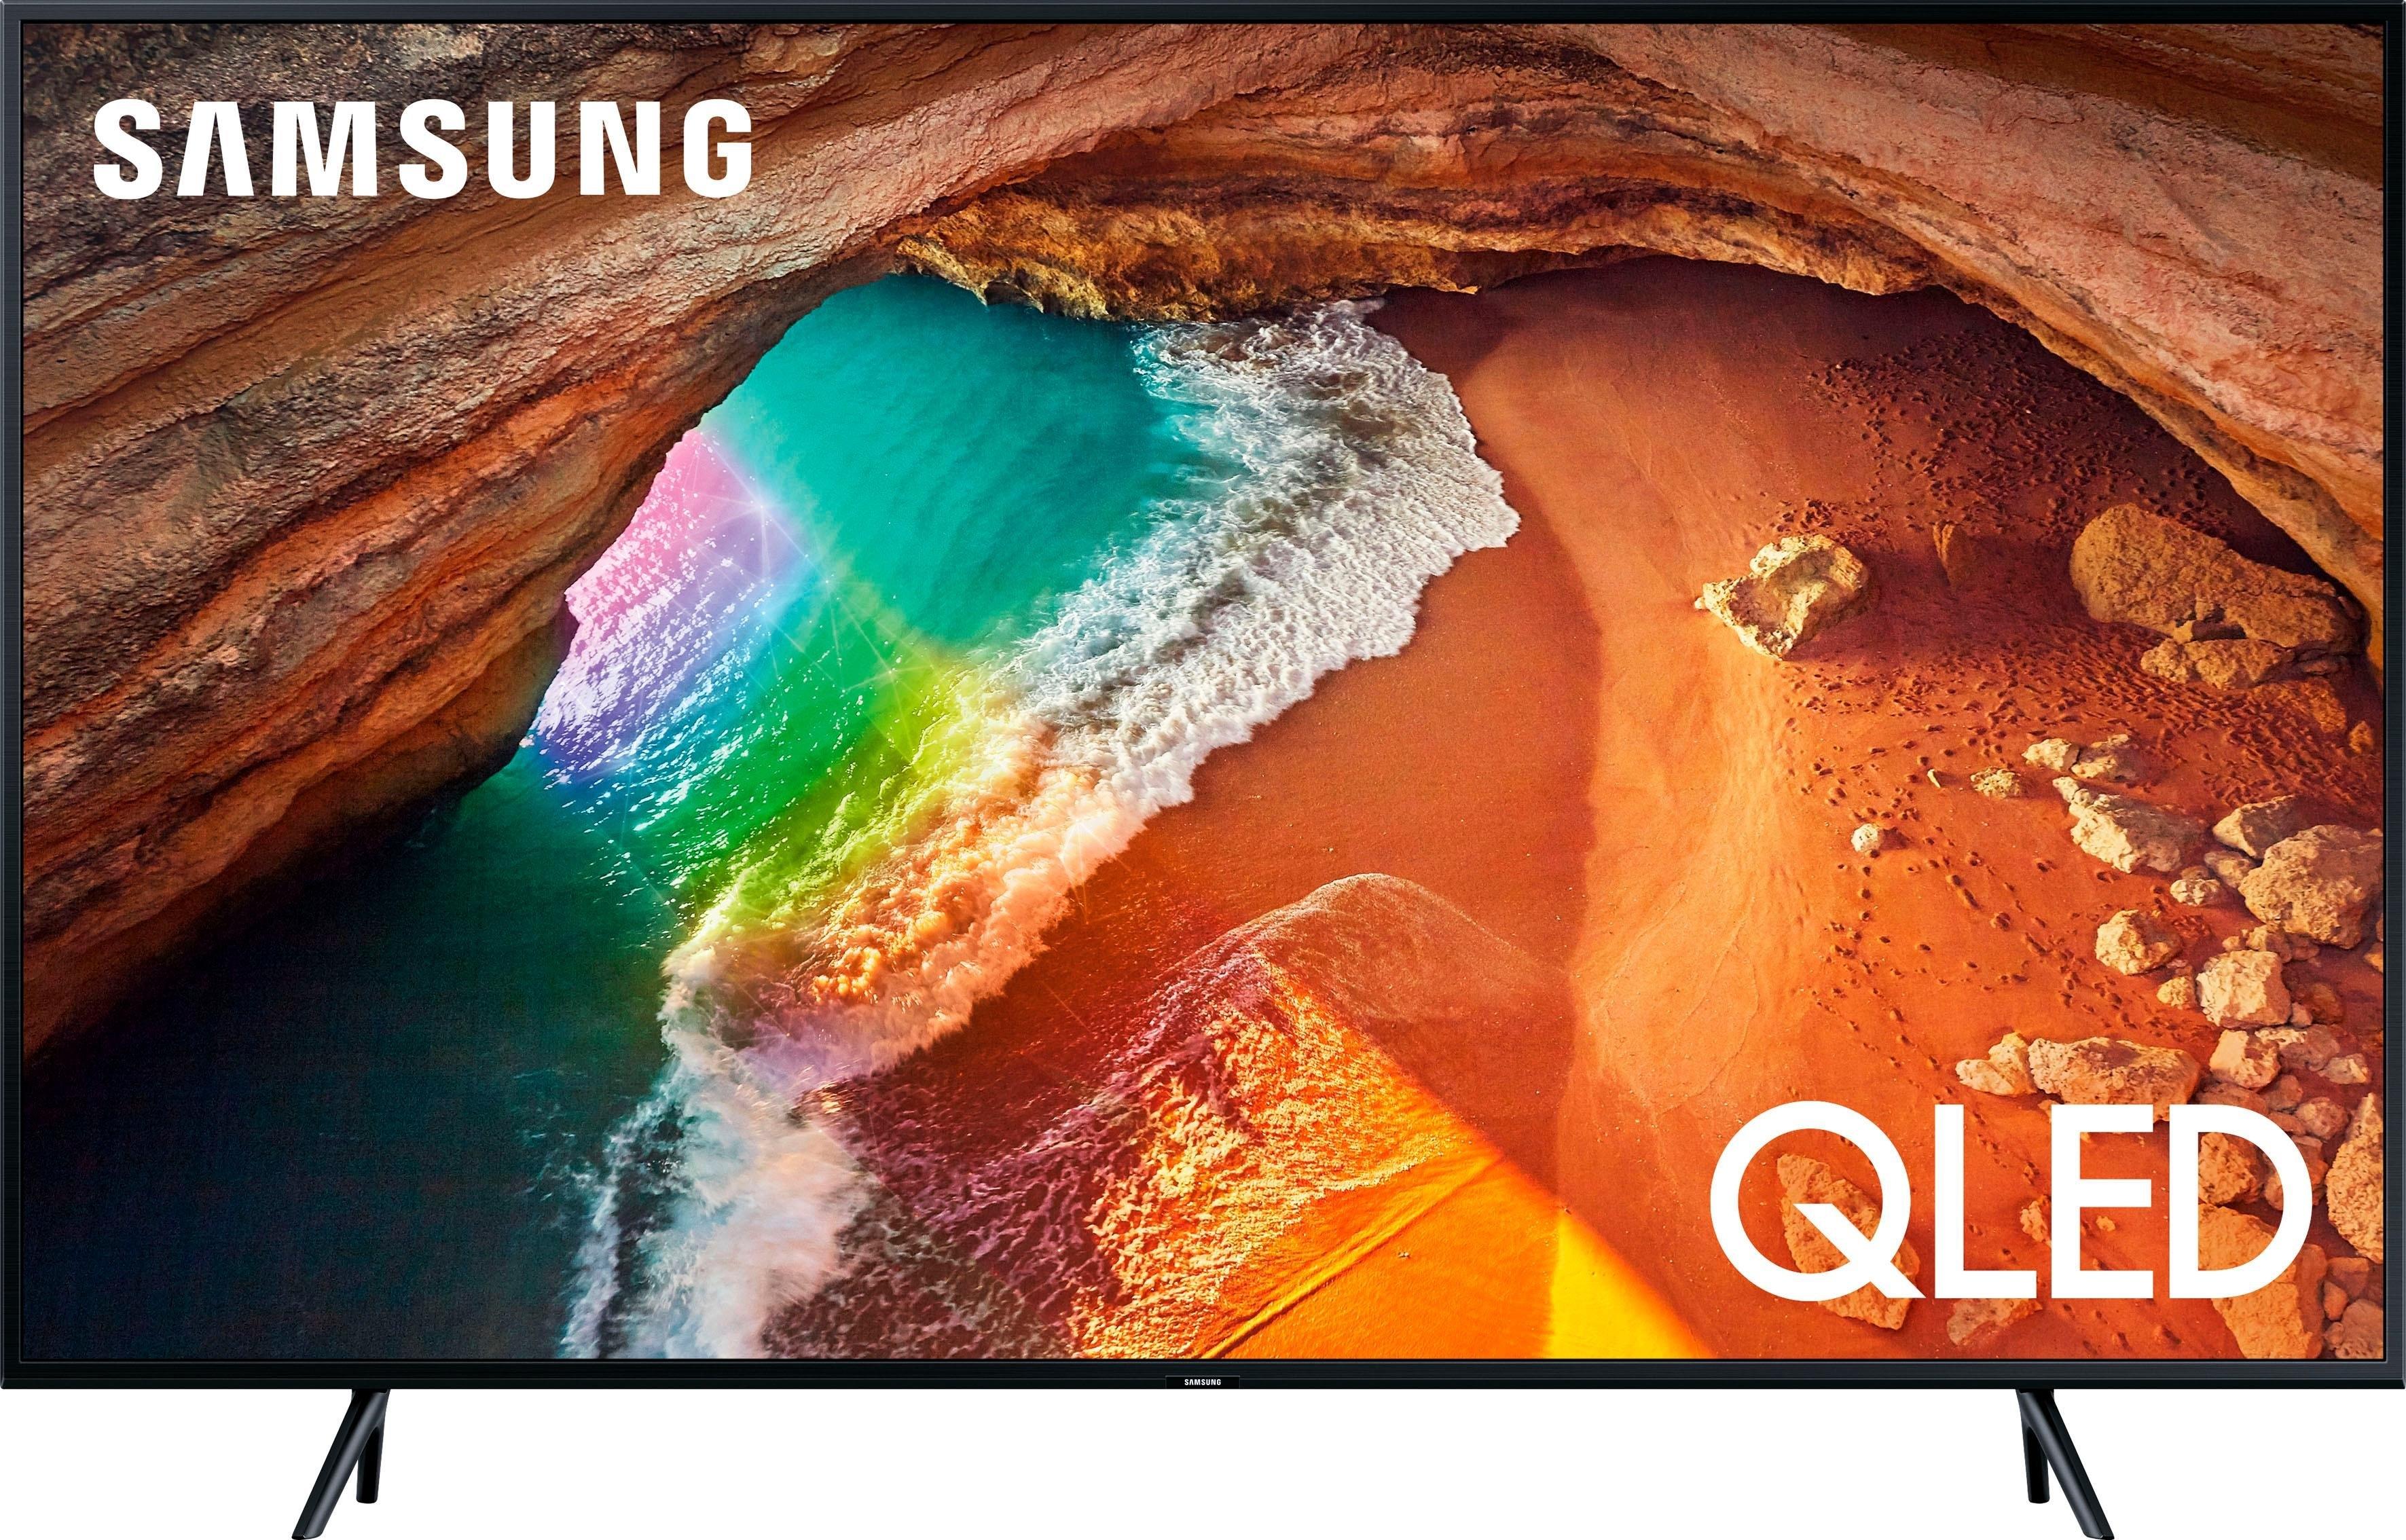 SAMSUNG GQ55Q60R QLED-tv (138 cm / 55 inch), 4K Ultra HD, Smart-TV - gratis ruilen op otto.nl